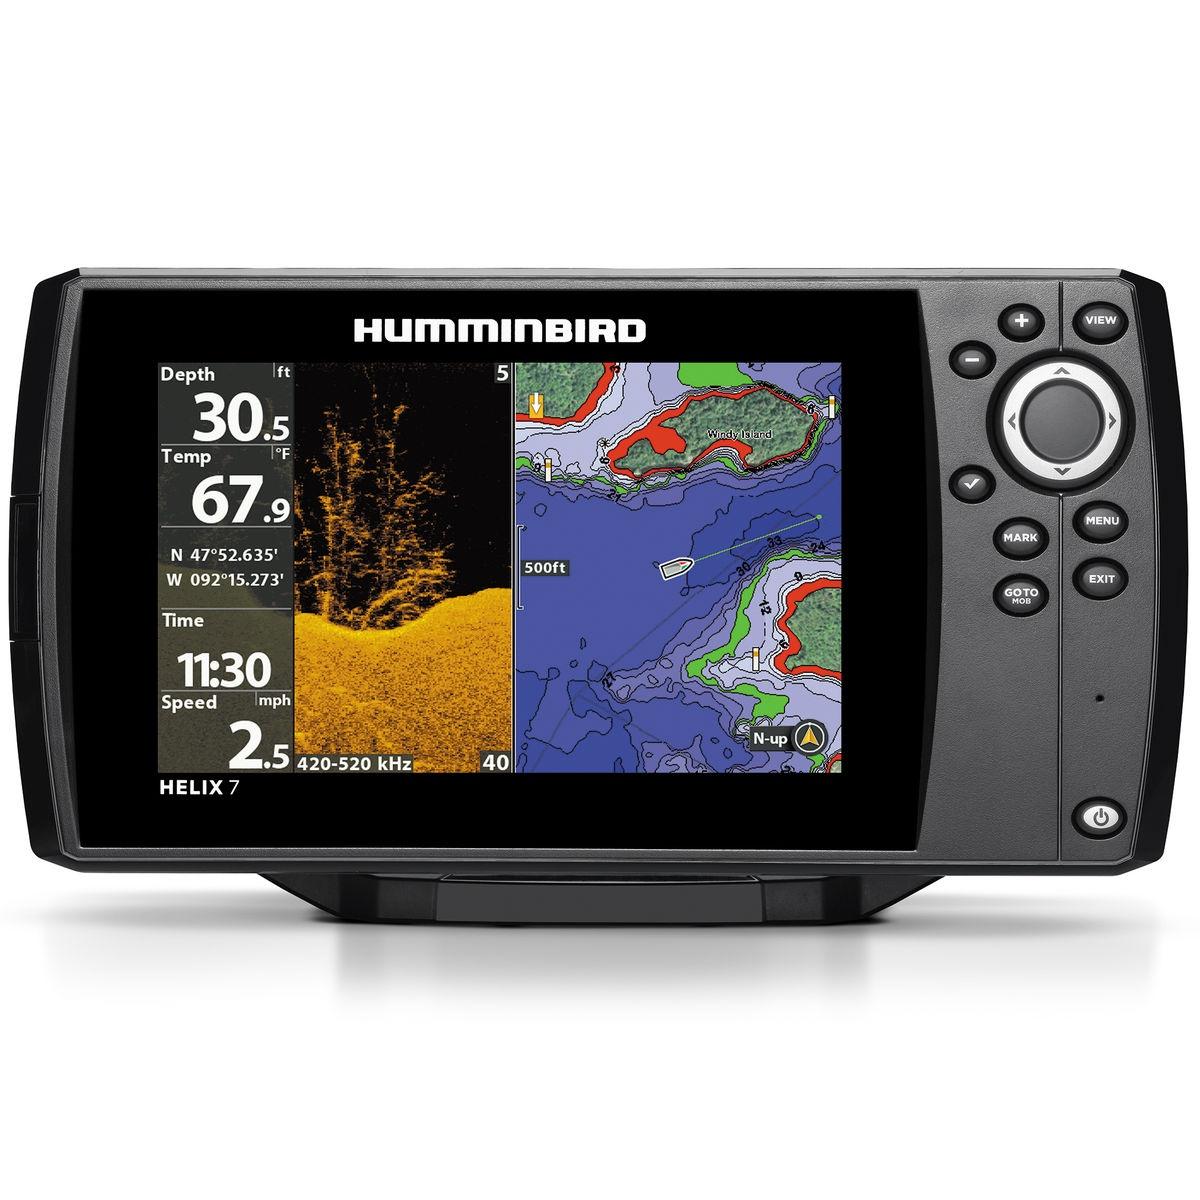 Эхолот Humminbird Helix 7x Chirp DI GPS G2N Eth/BT/ACL raymarine quantum™ беспроводной chirp радар